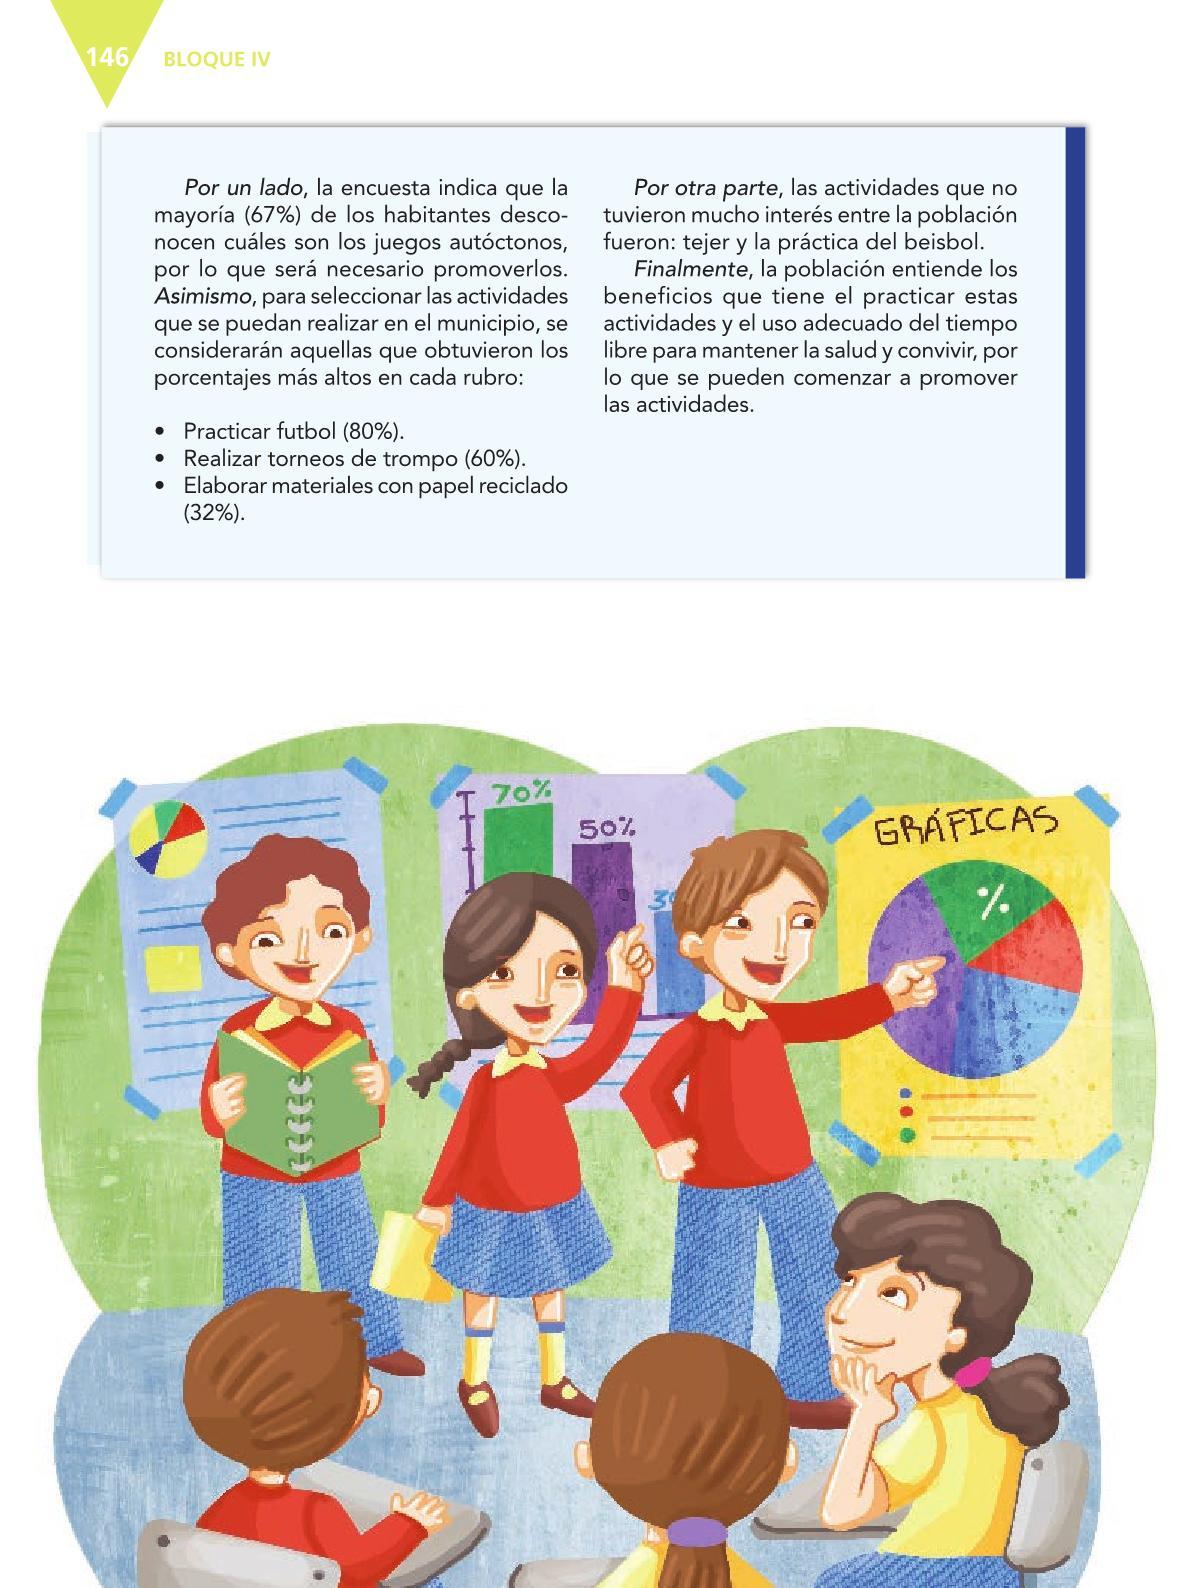 Español Libro para el alumnoquintoPagina 146